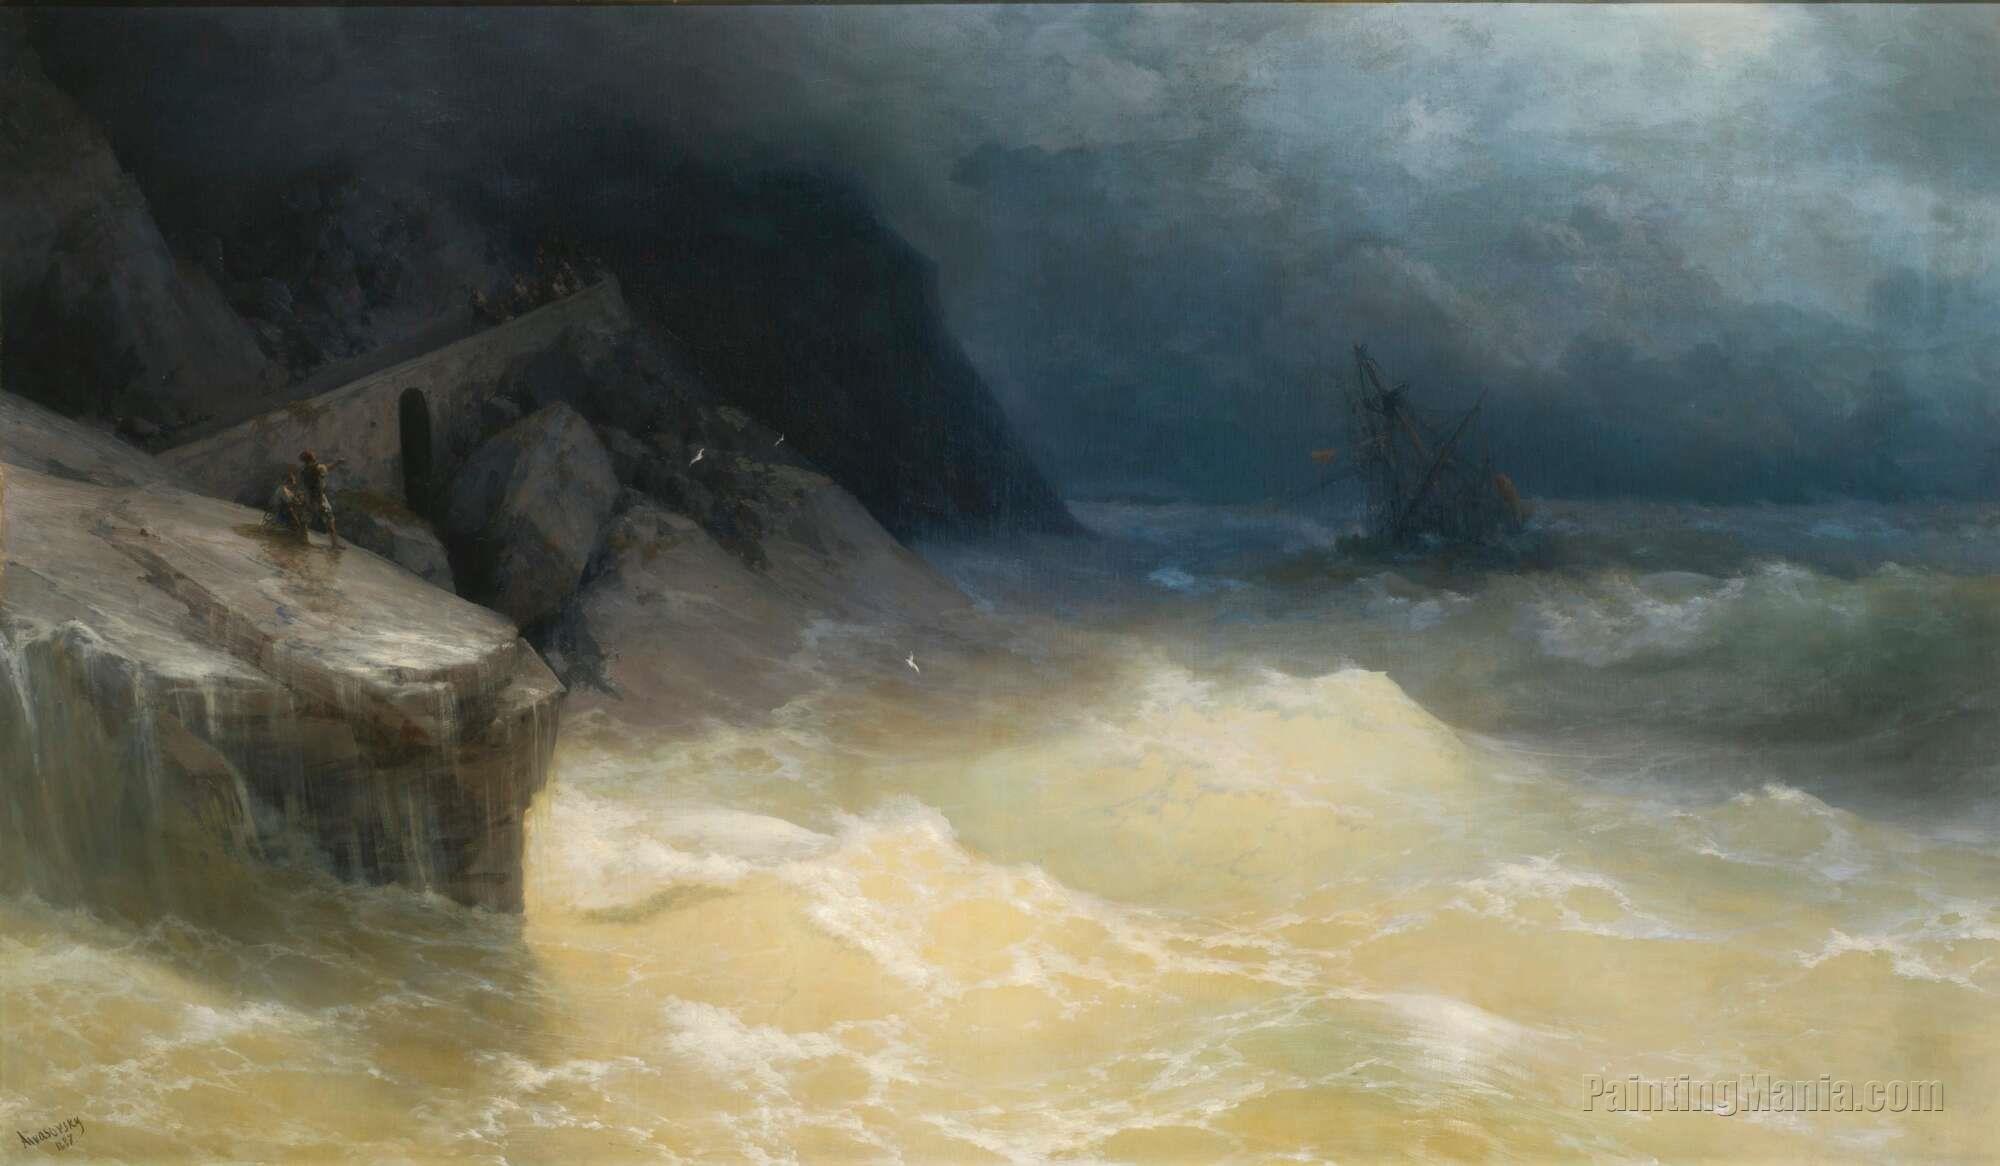 Shipwreck off the Black Sea Coast